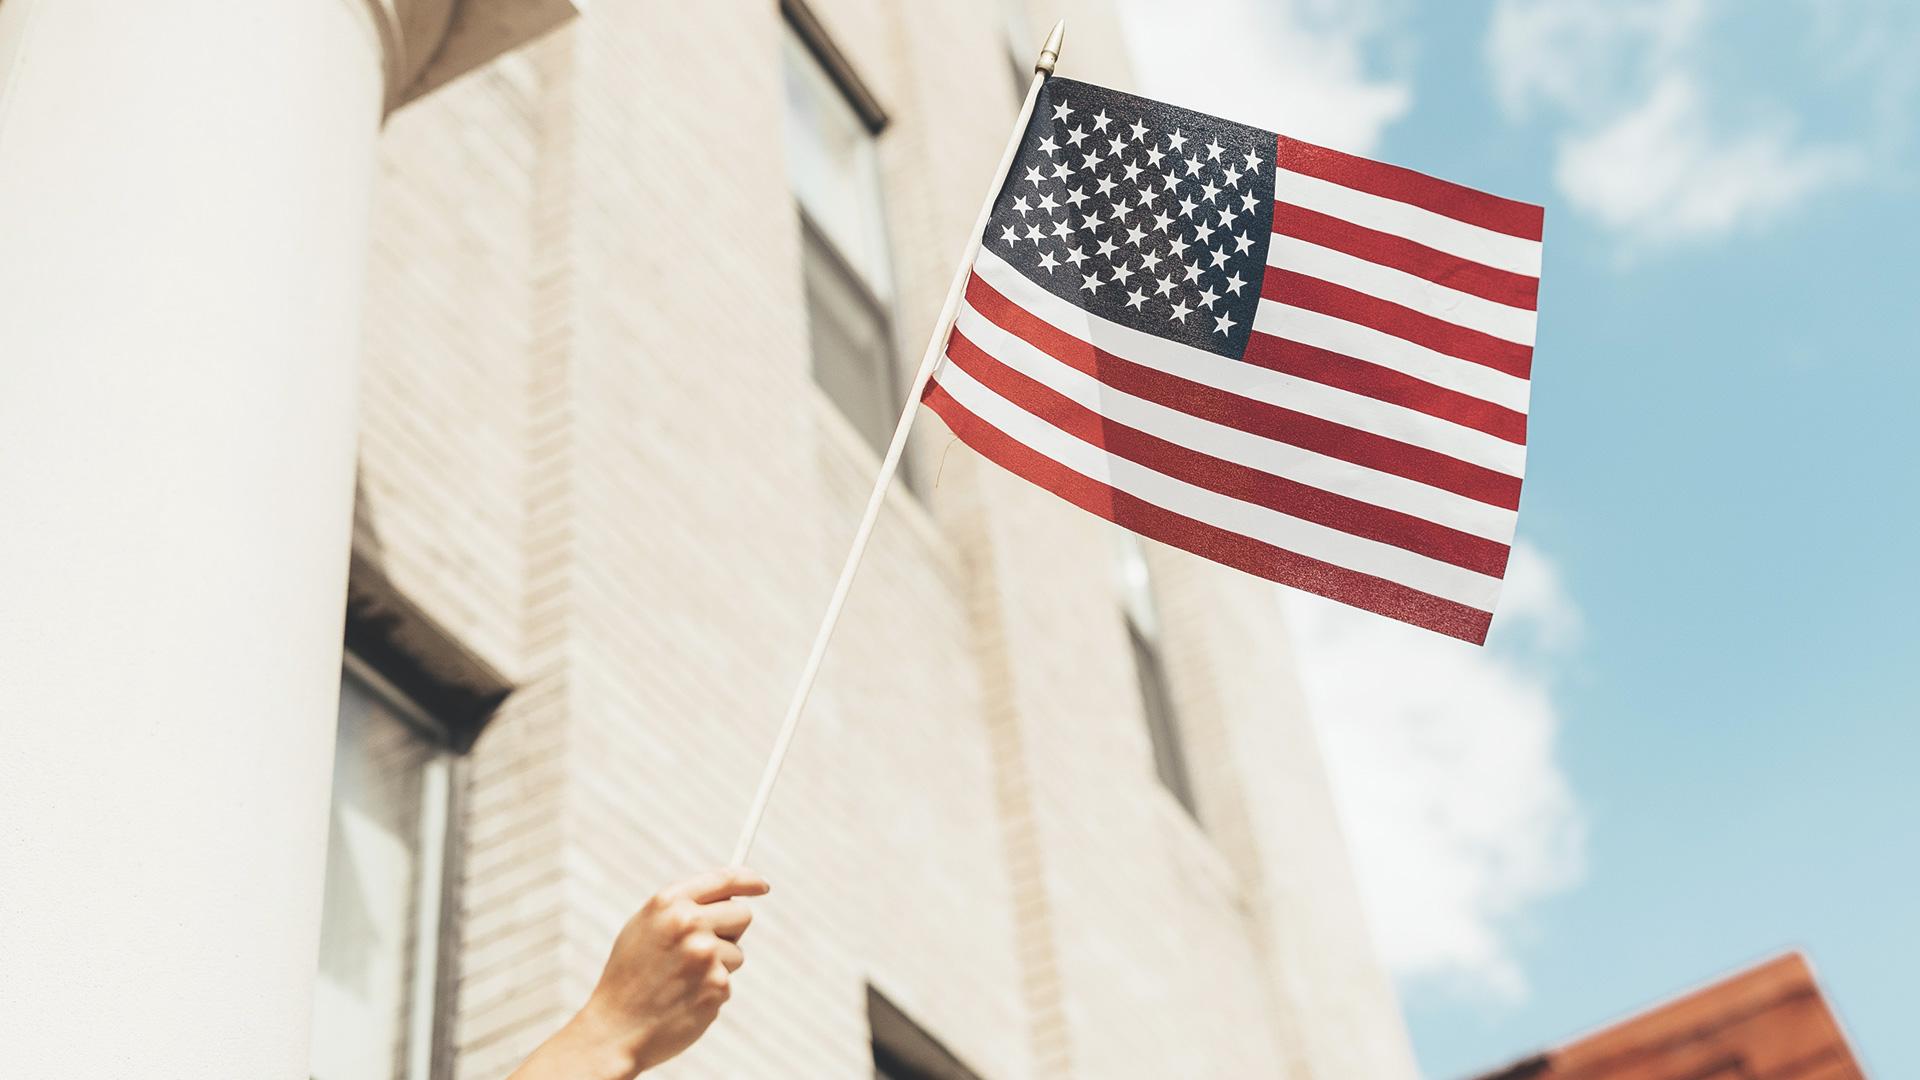 Joe Battaglia | Make America Good Again | Steve Brown, Etc.